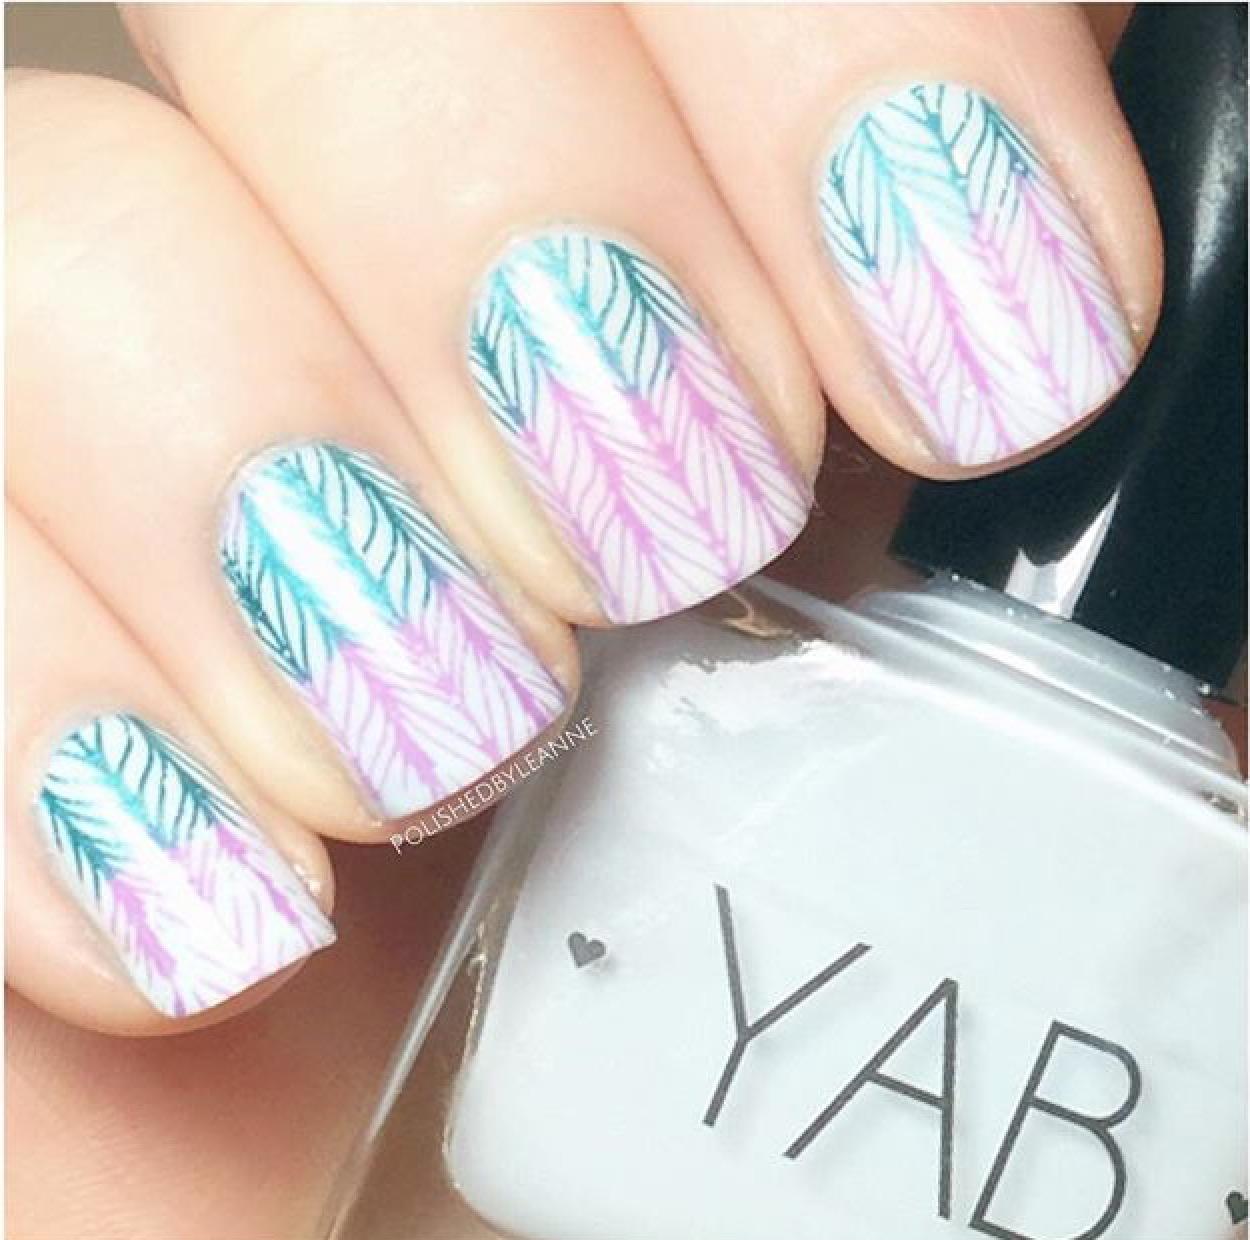 Knitty Nails